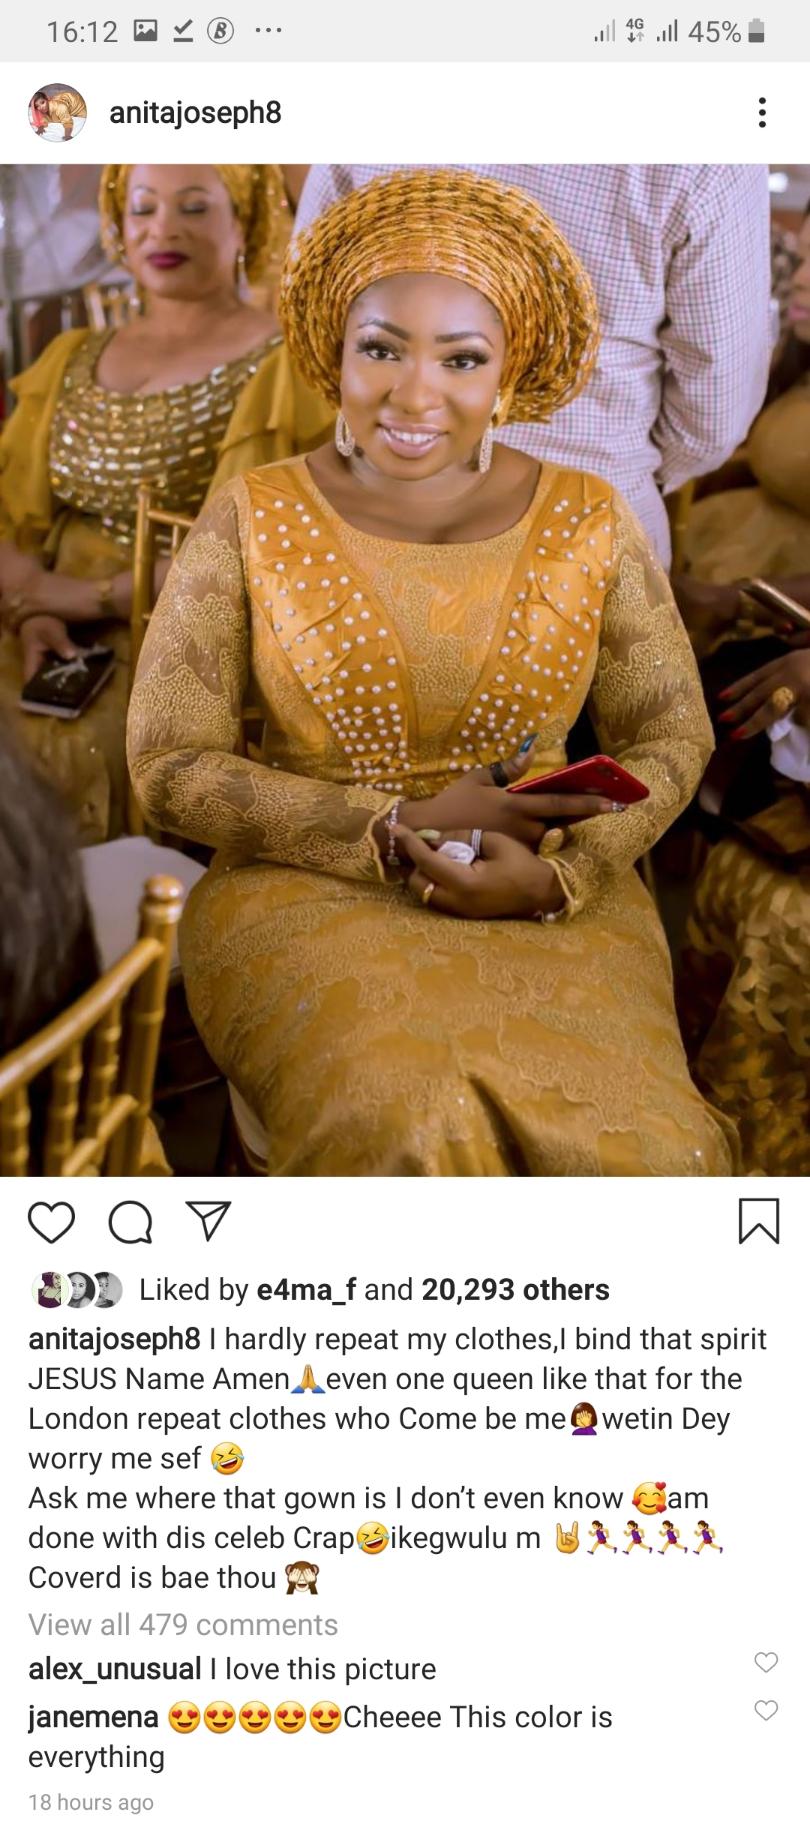 Screenshot 20191111 161202 Instagram - I Hardly Repeat Cloths, Says Nollywood Actress Anita Joseph